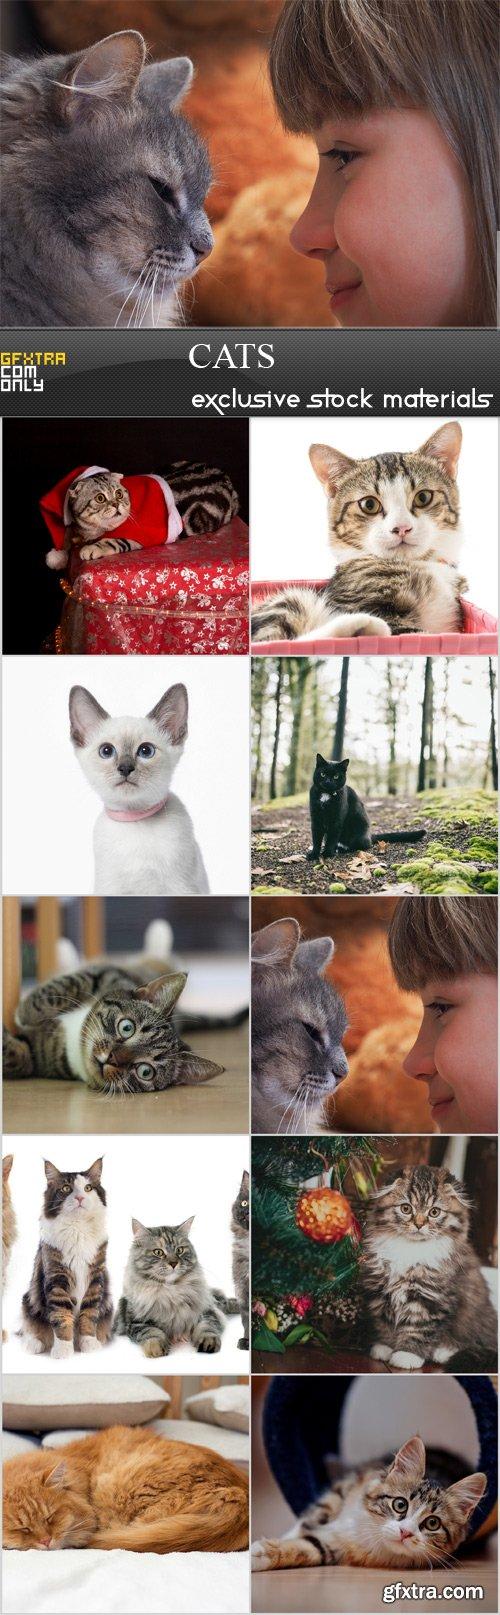 cats - 10 JPEG